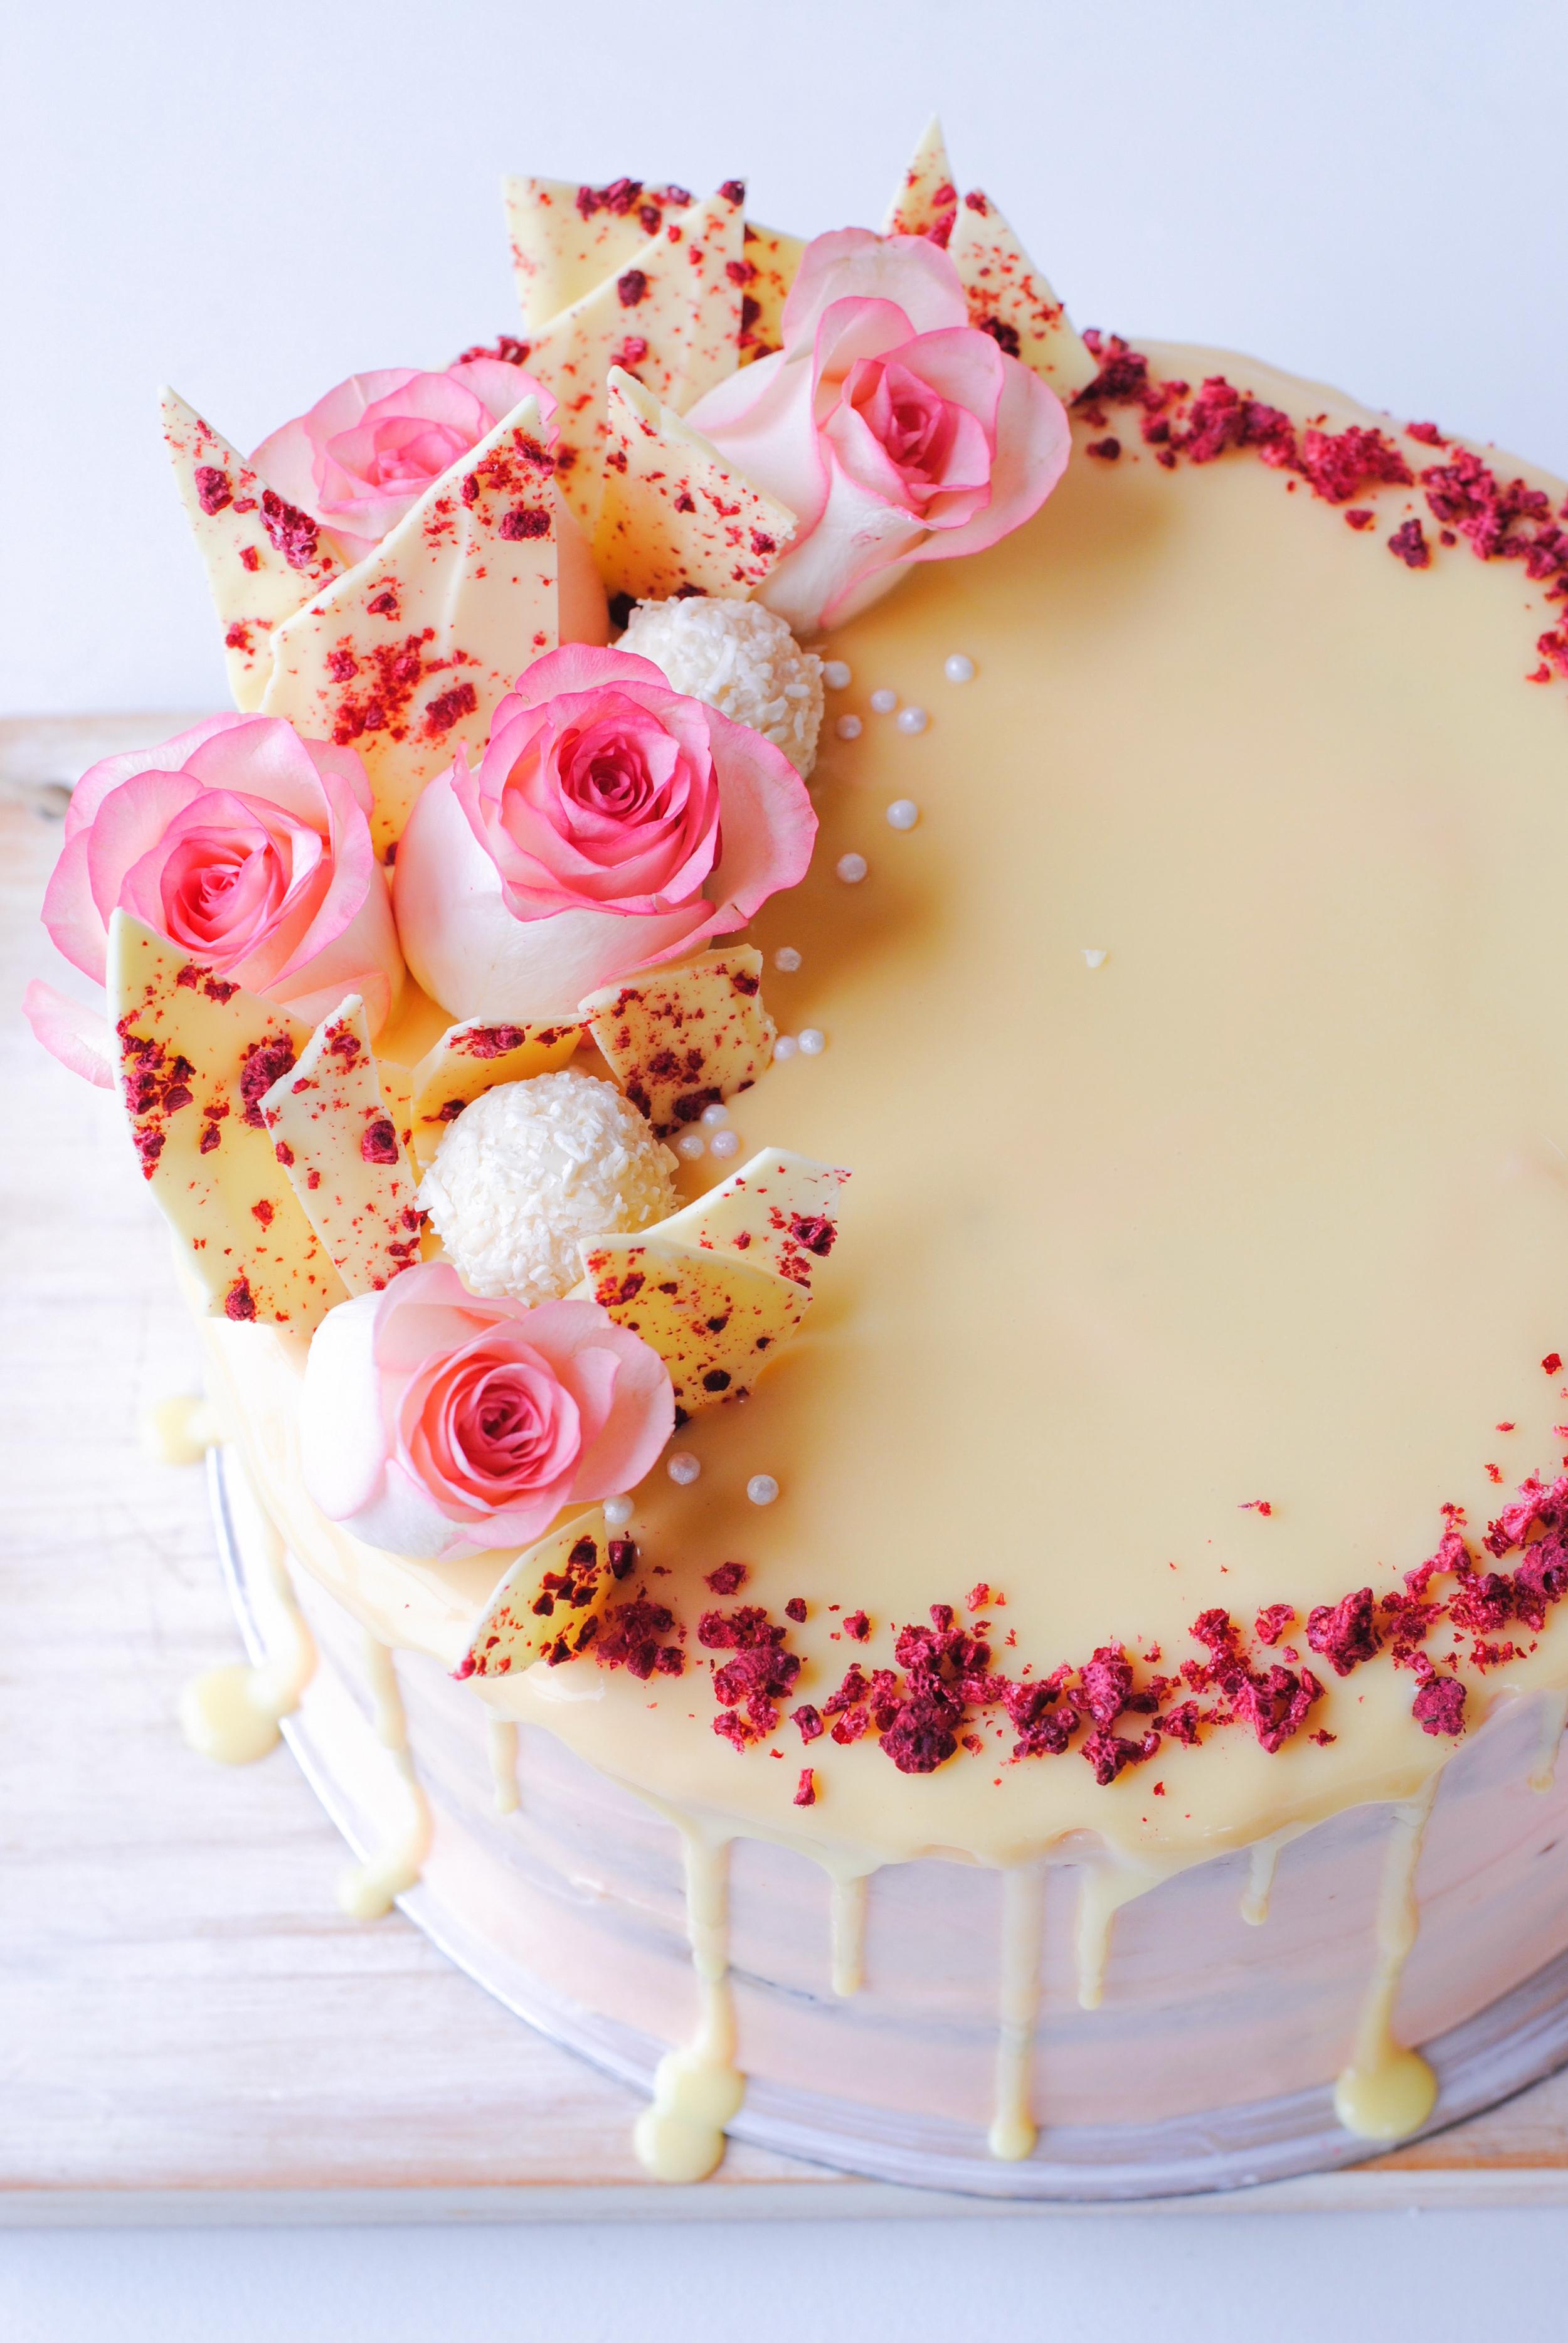 Raspberry White Chocolate Rhubarb Layer Cake The Hungry Cook